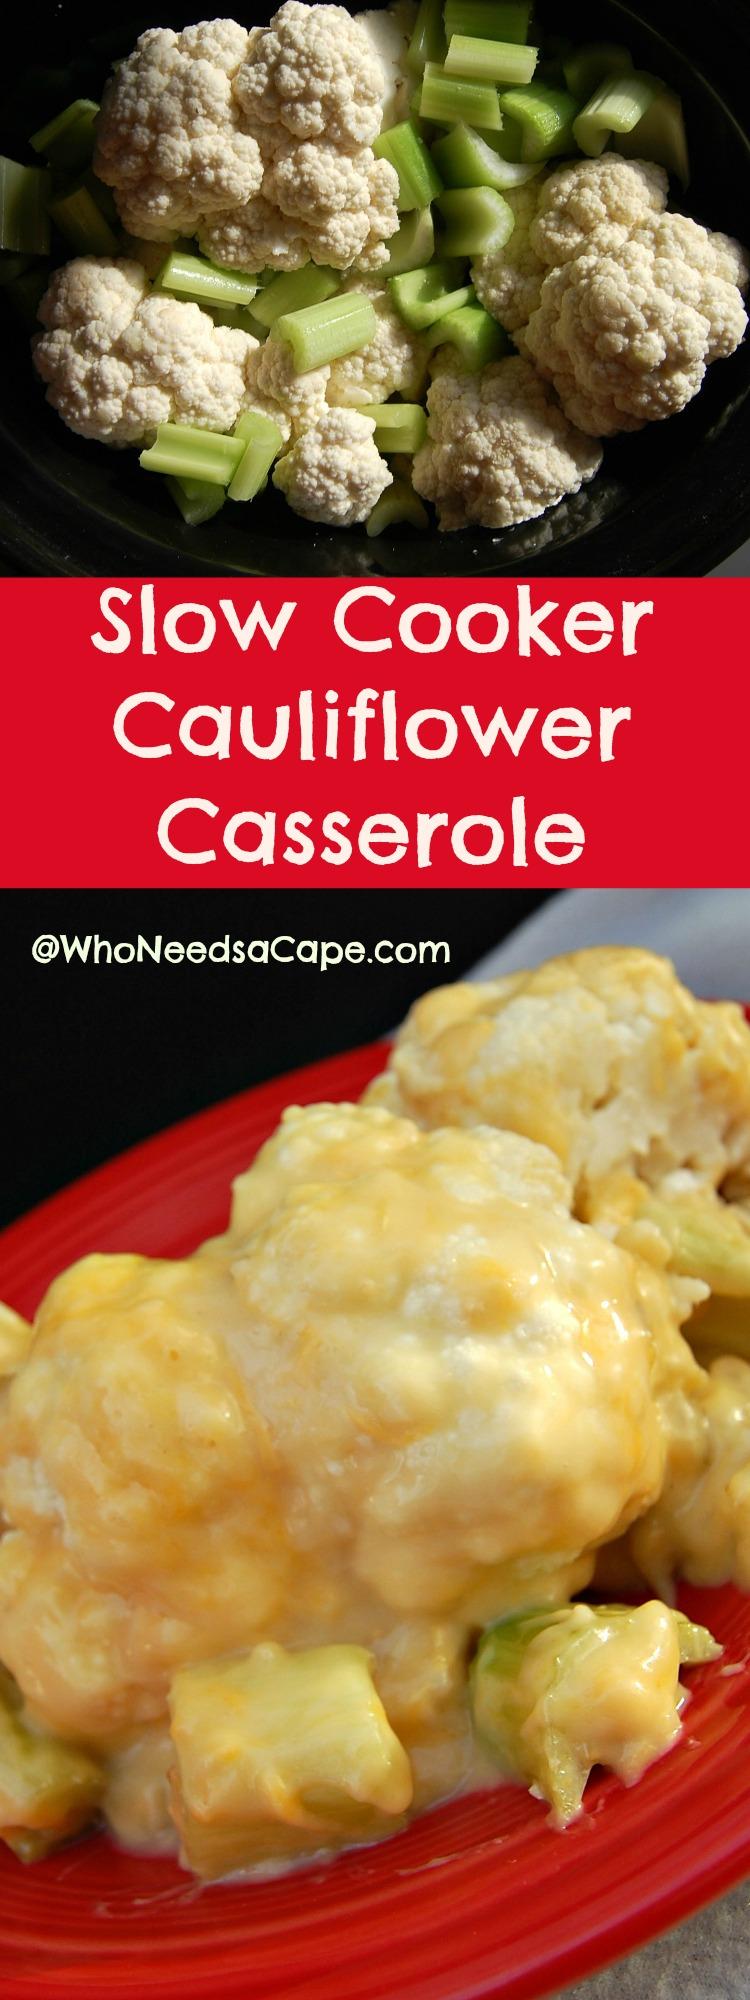 Casseroles and church dishes on Pinterest | Casseroles, Casserole ...